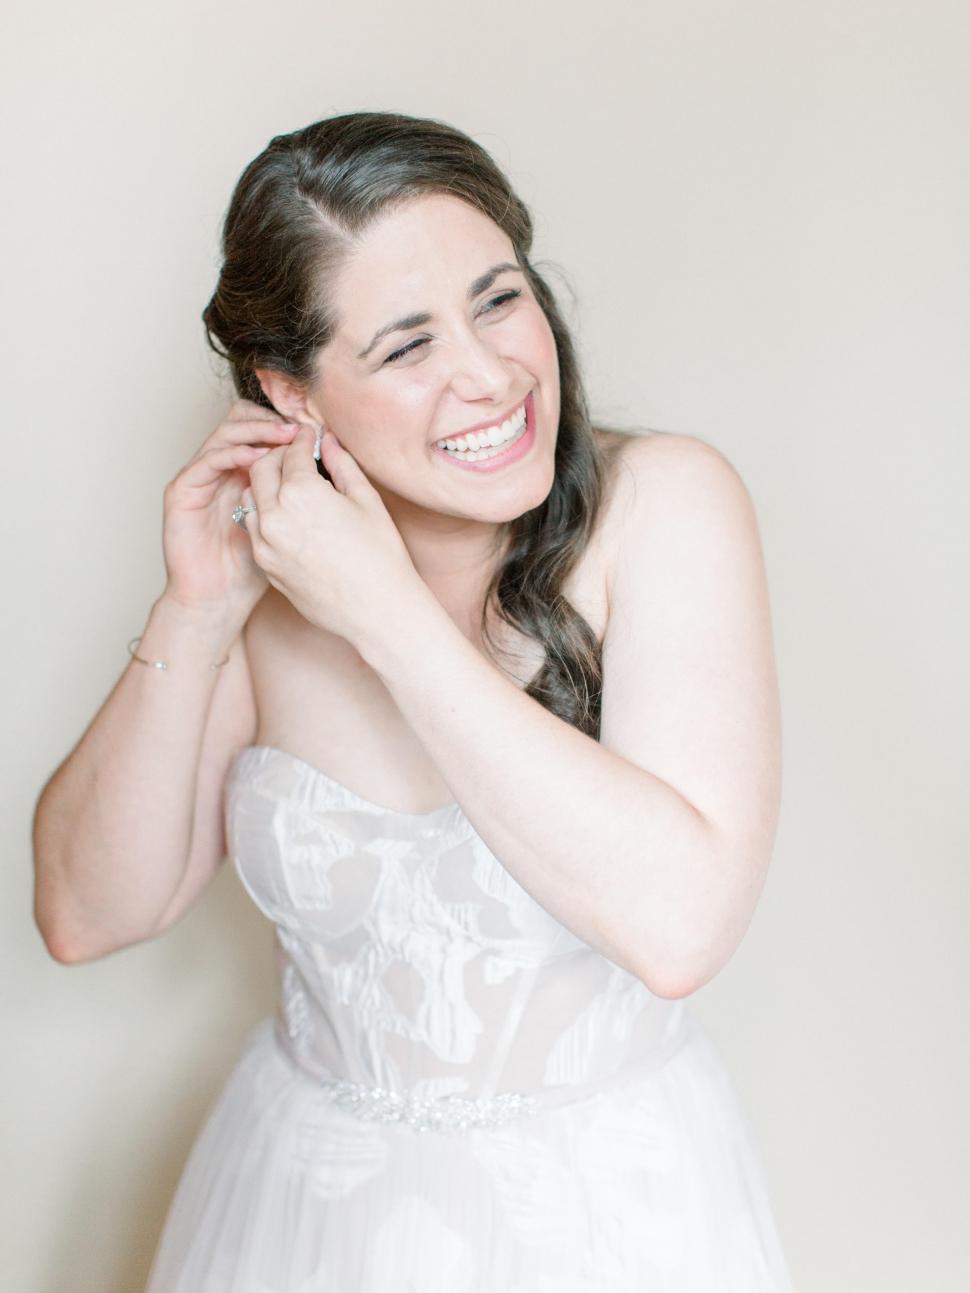 Philadelphia-Wedding-Photographer-Cassi-Claire-Cork-Factory-Hotel-Wedding_03.jpg